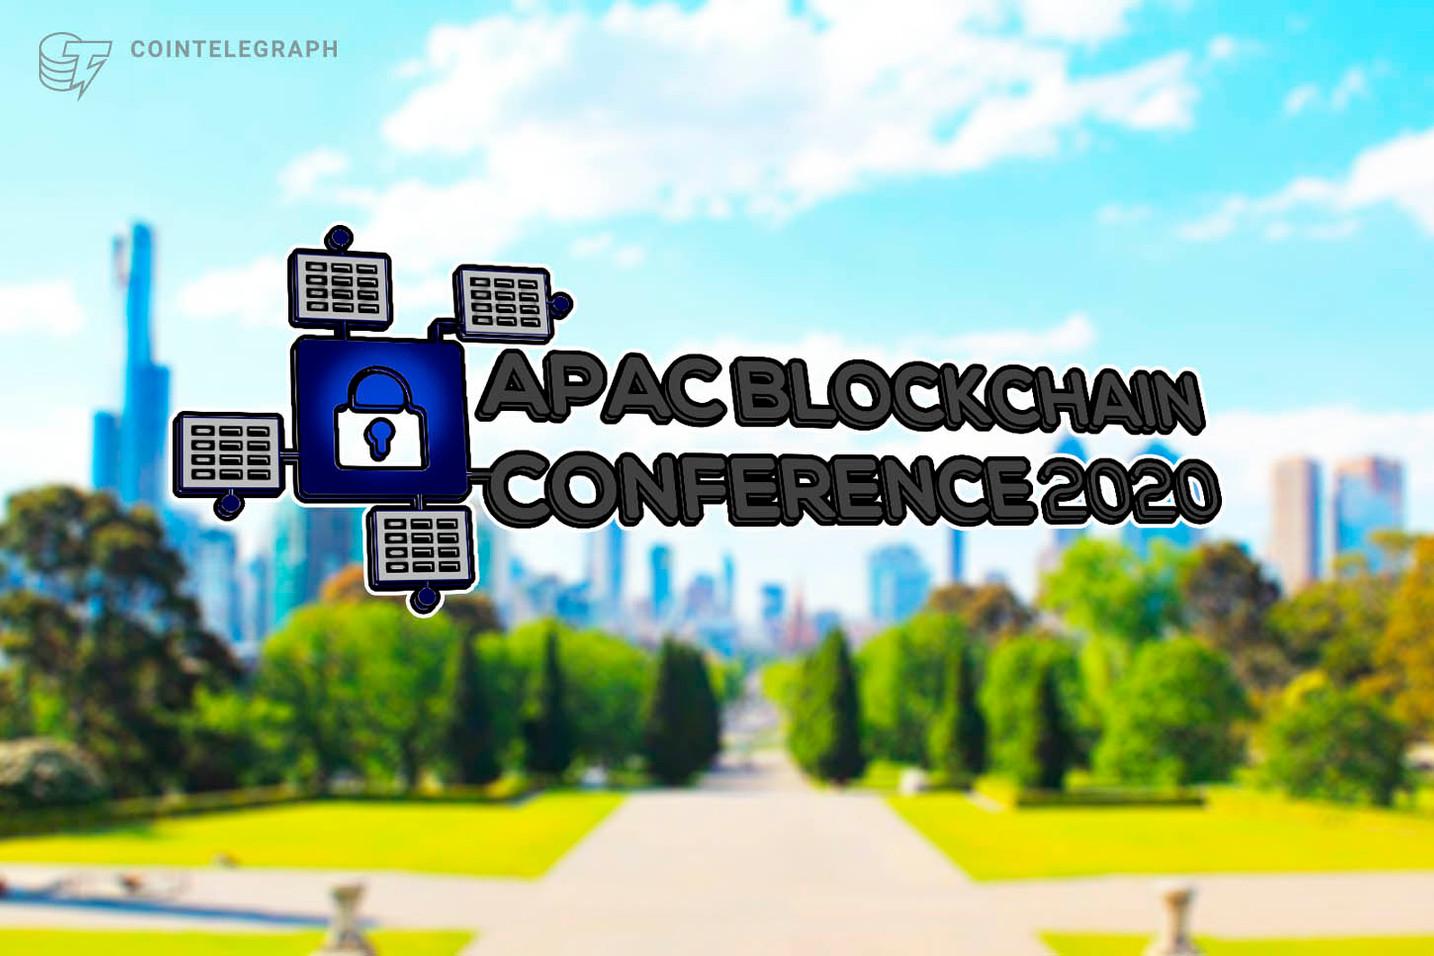 APAC Blockchain: Advancing the Blockchain Ecosystem in Australia